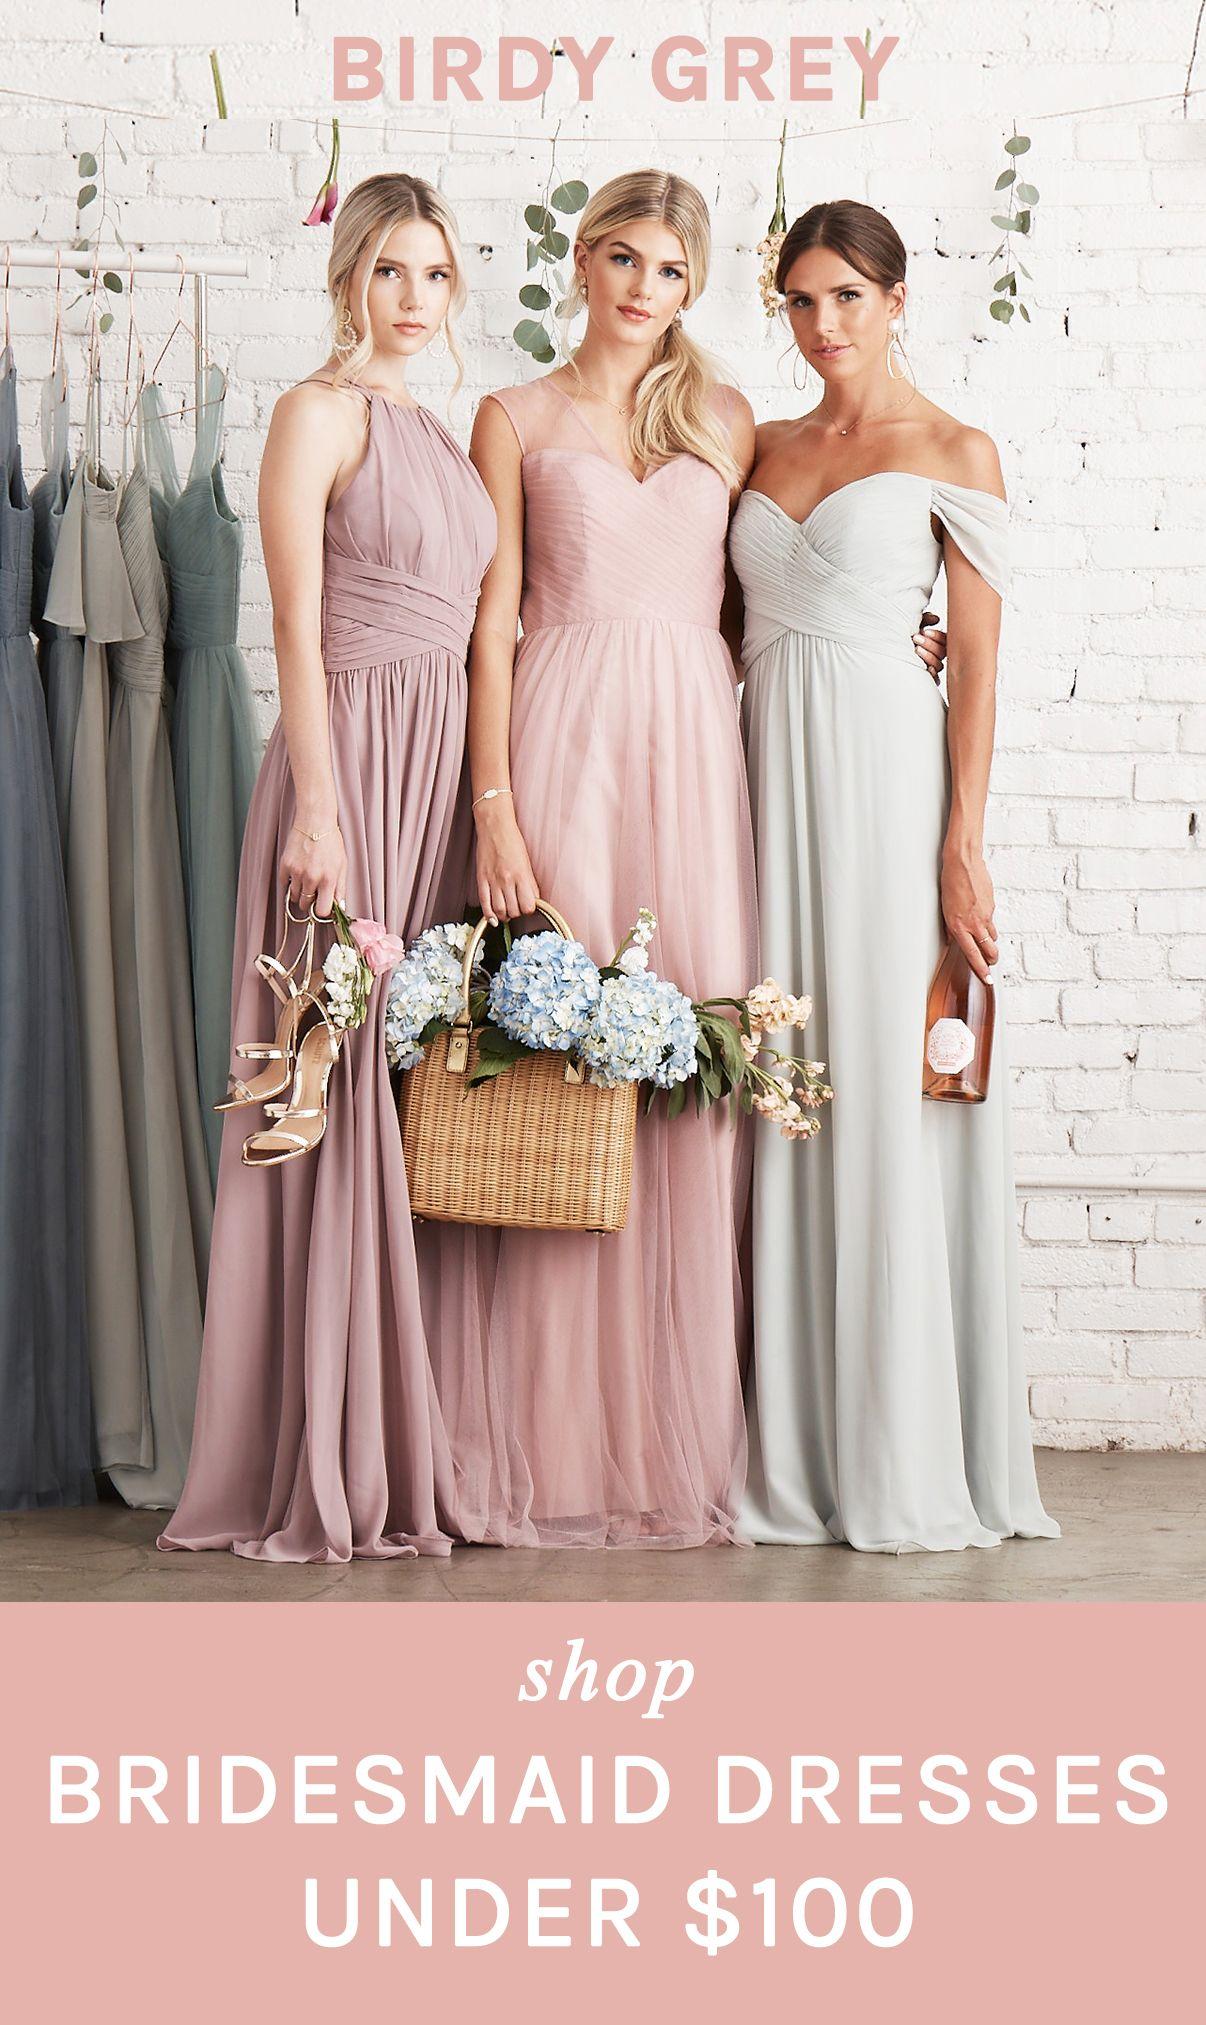 Shop fresh, flattering bridesmaid dresses